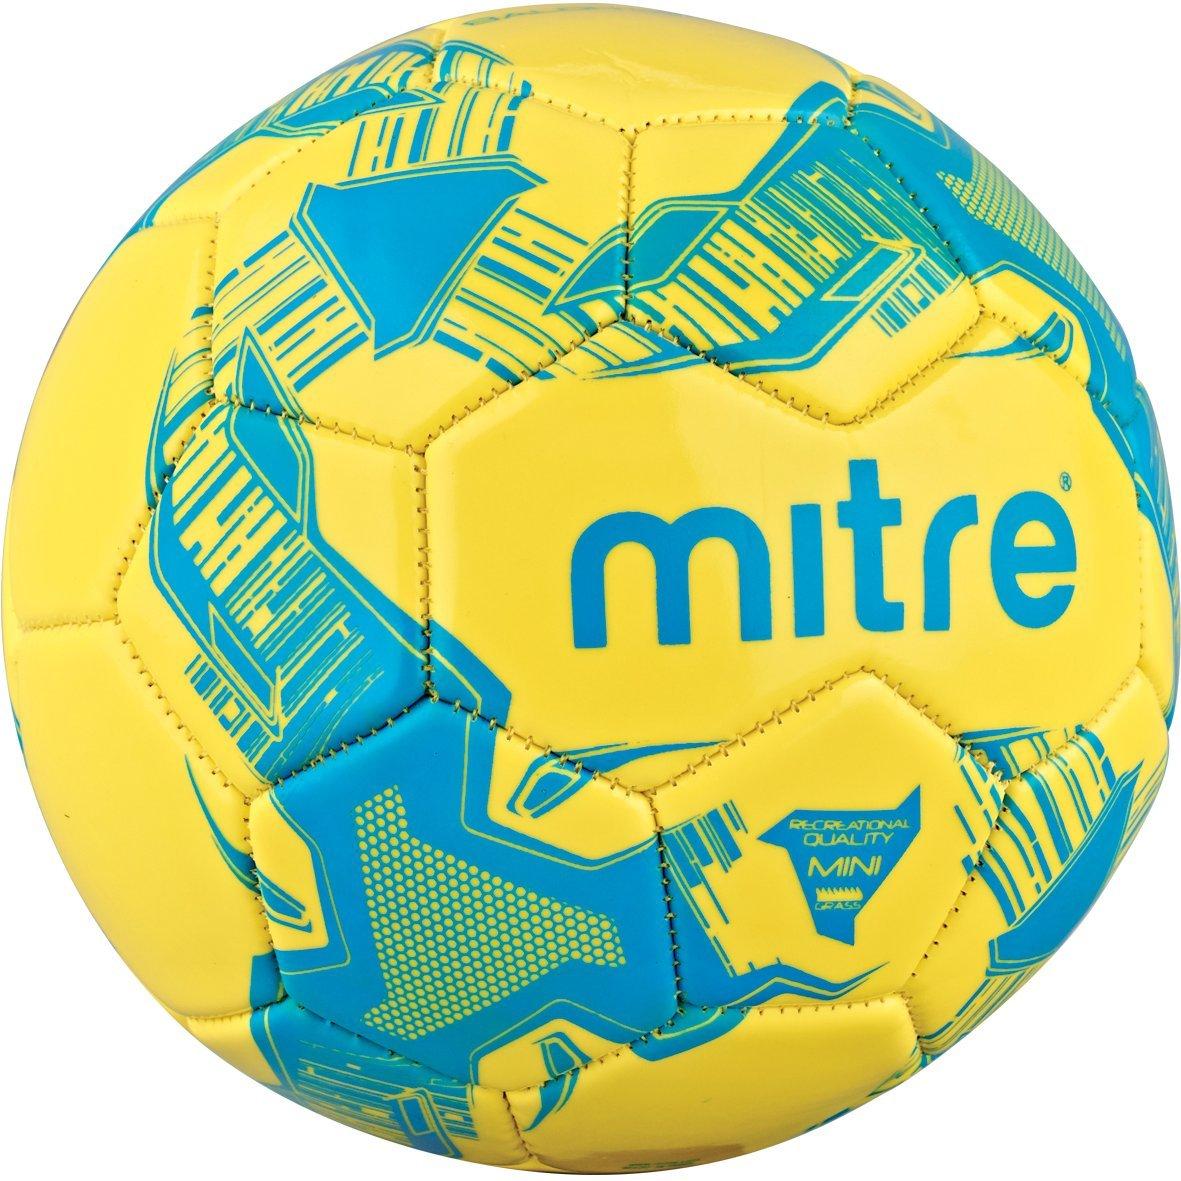 Mitre Balon Football B018XXDKSE Yellow/Cyan Size 4